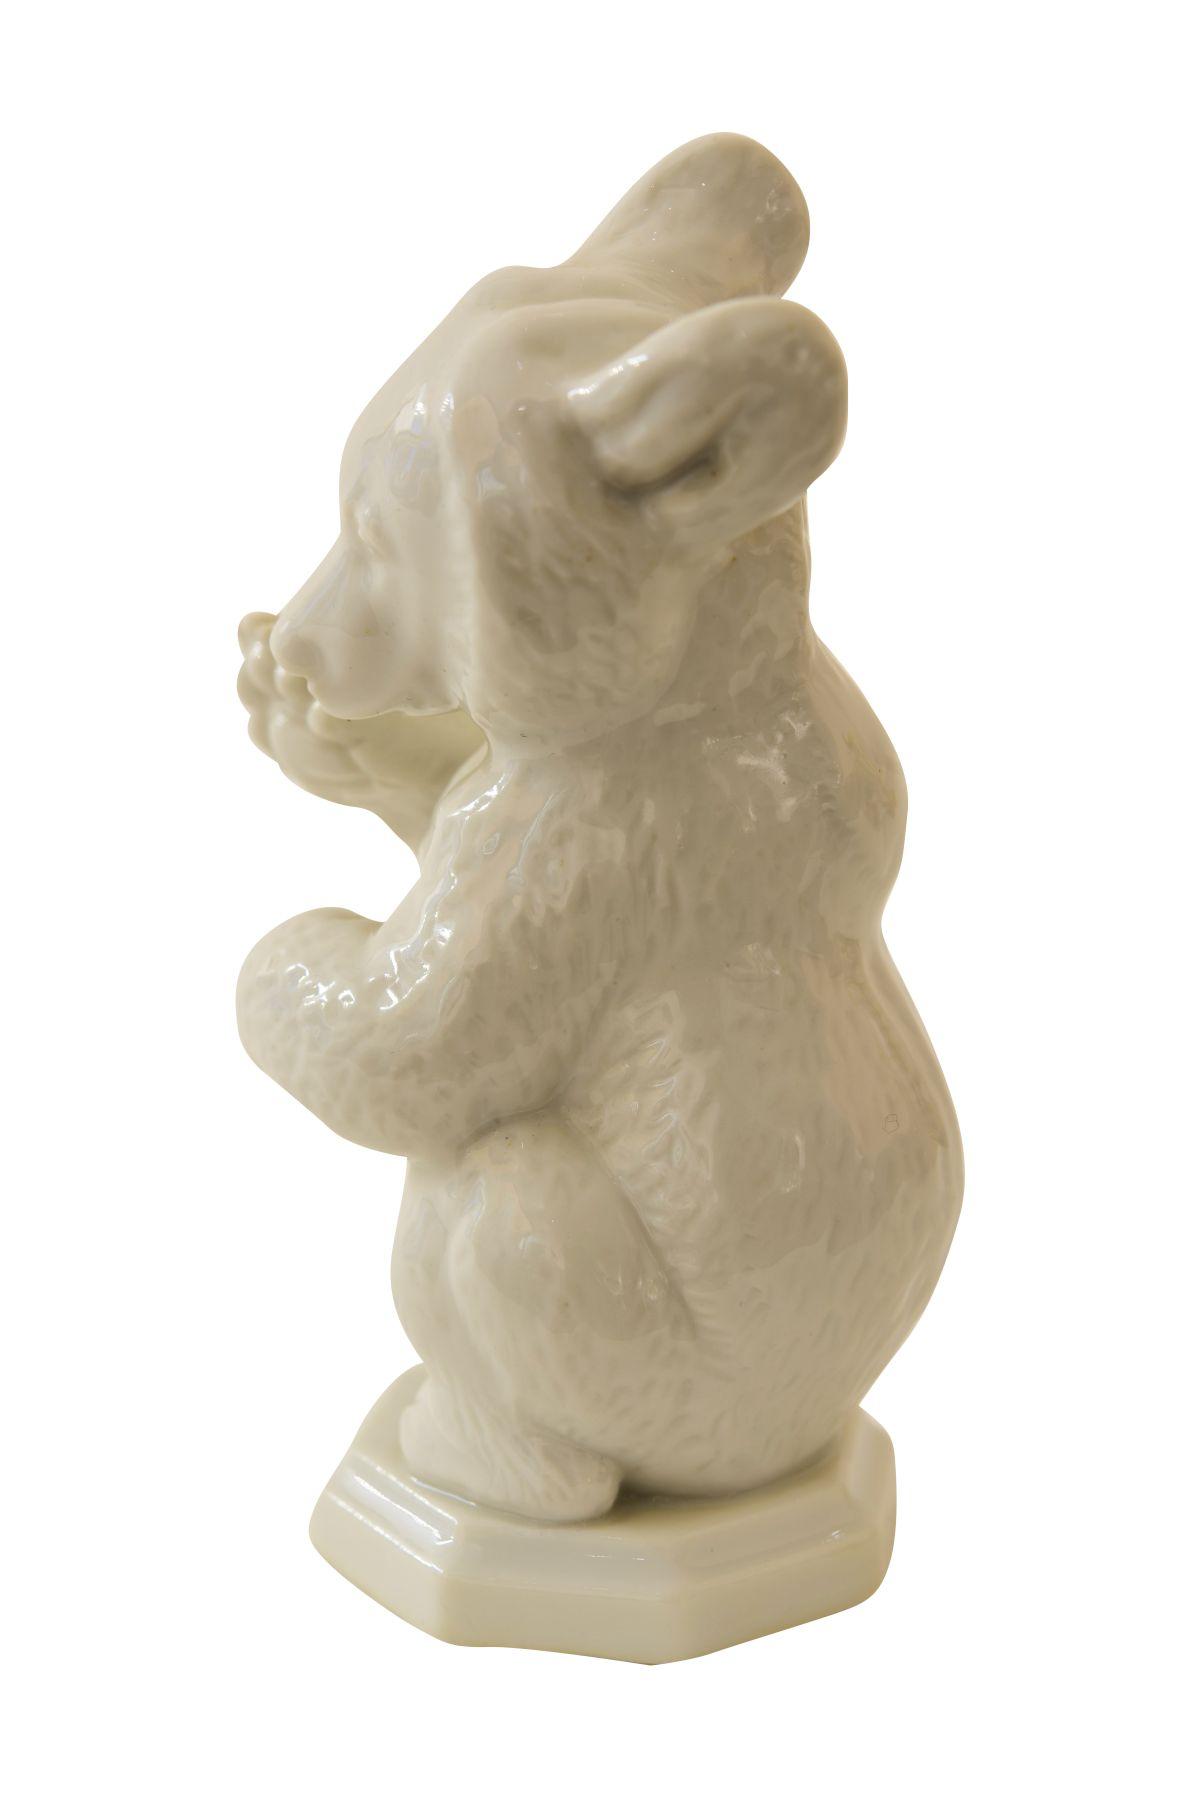 "#161 Bear begging Allach porcelain manufactory, Munich | "" Bär bittend"" Porzellanmanufaktur Allach, München Image"